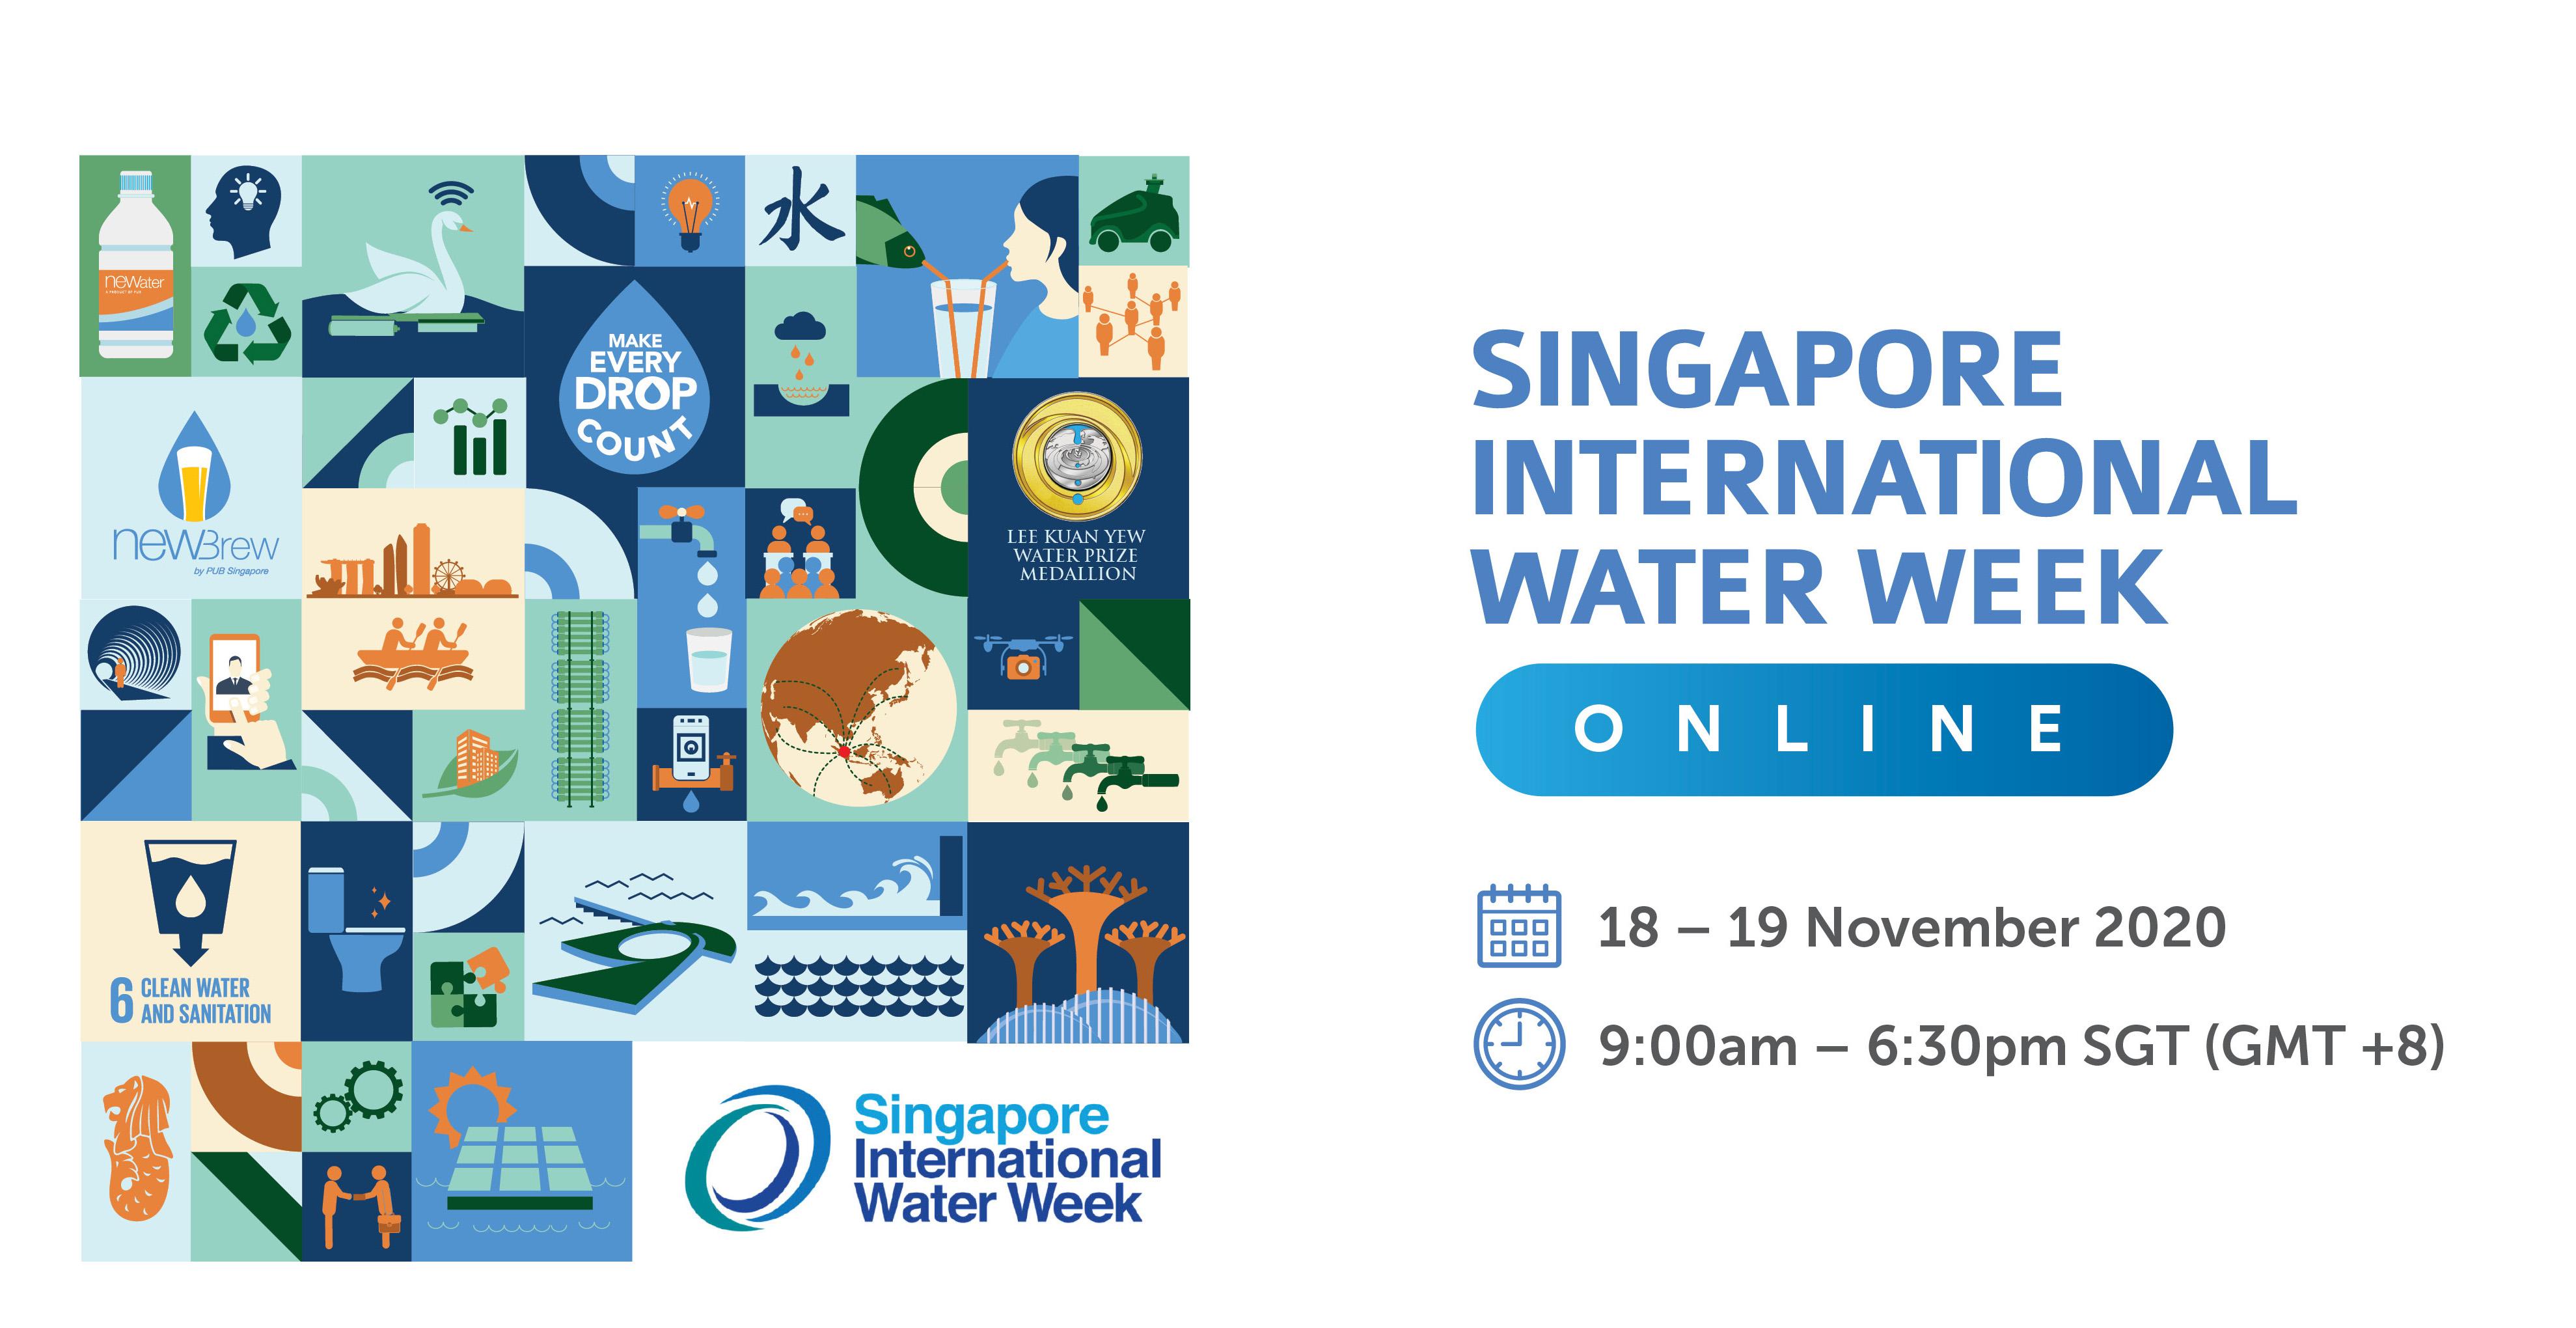 Singapore International Water Week Online